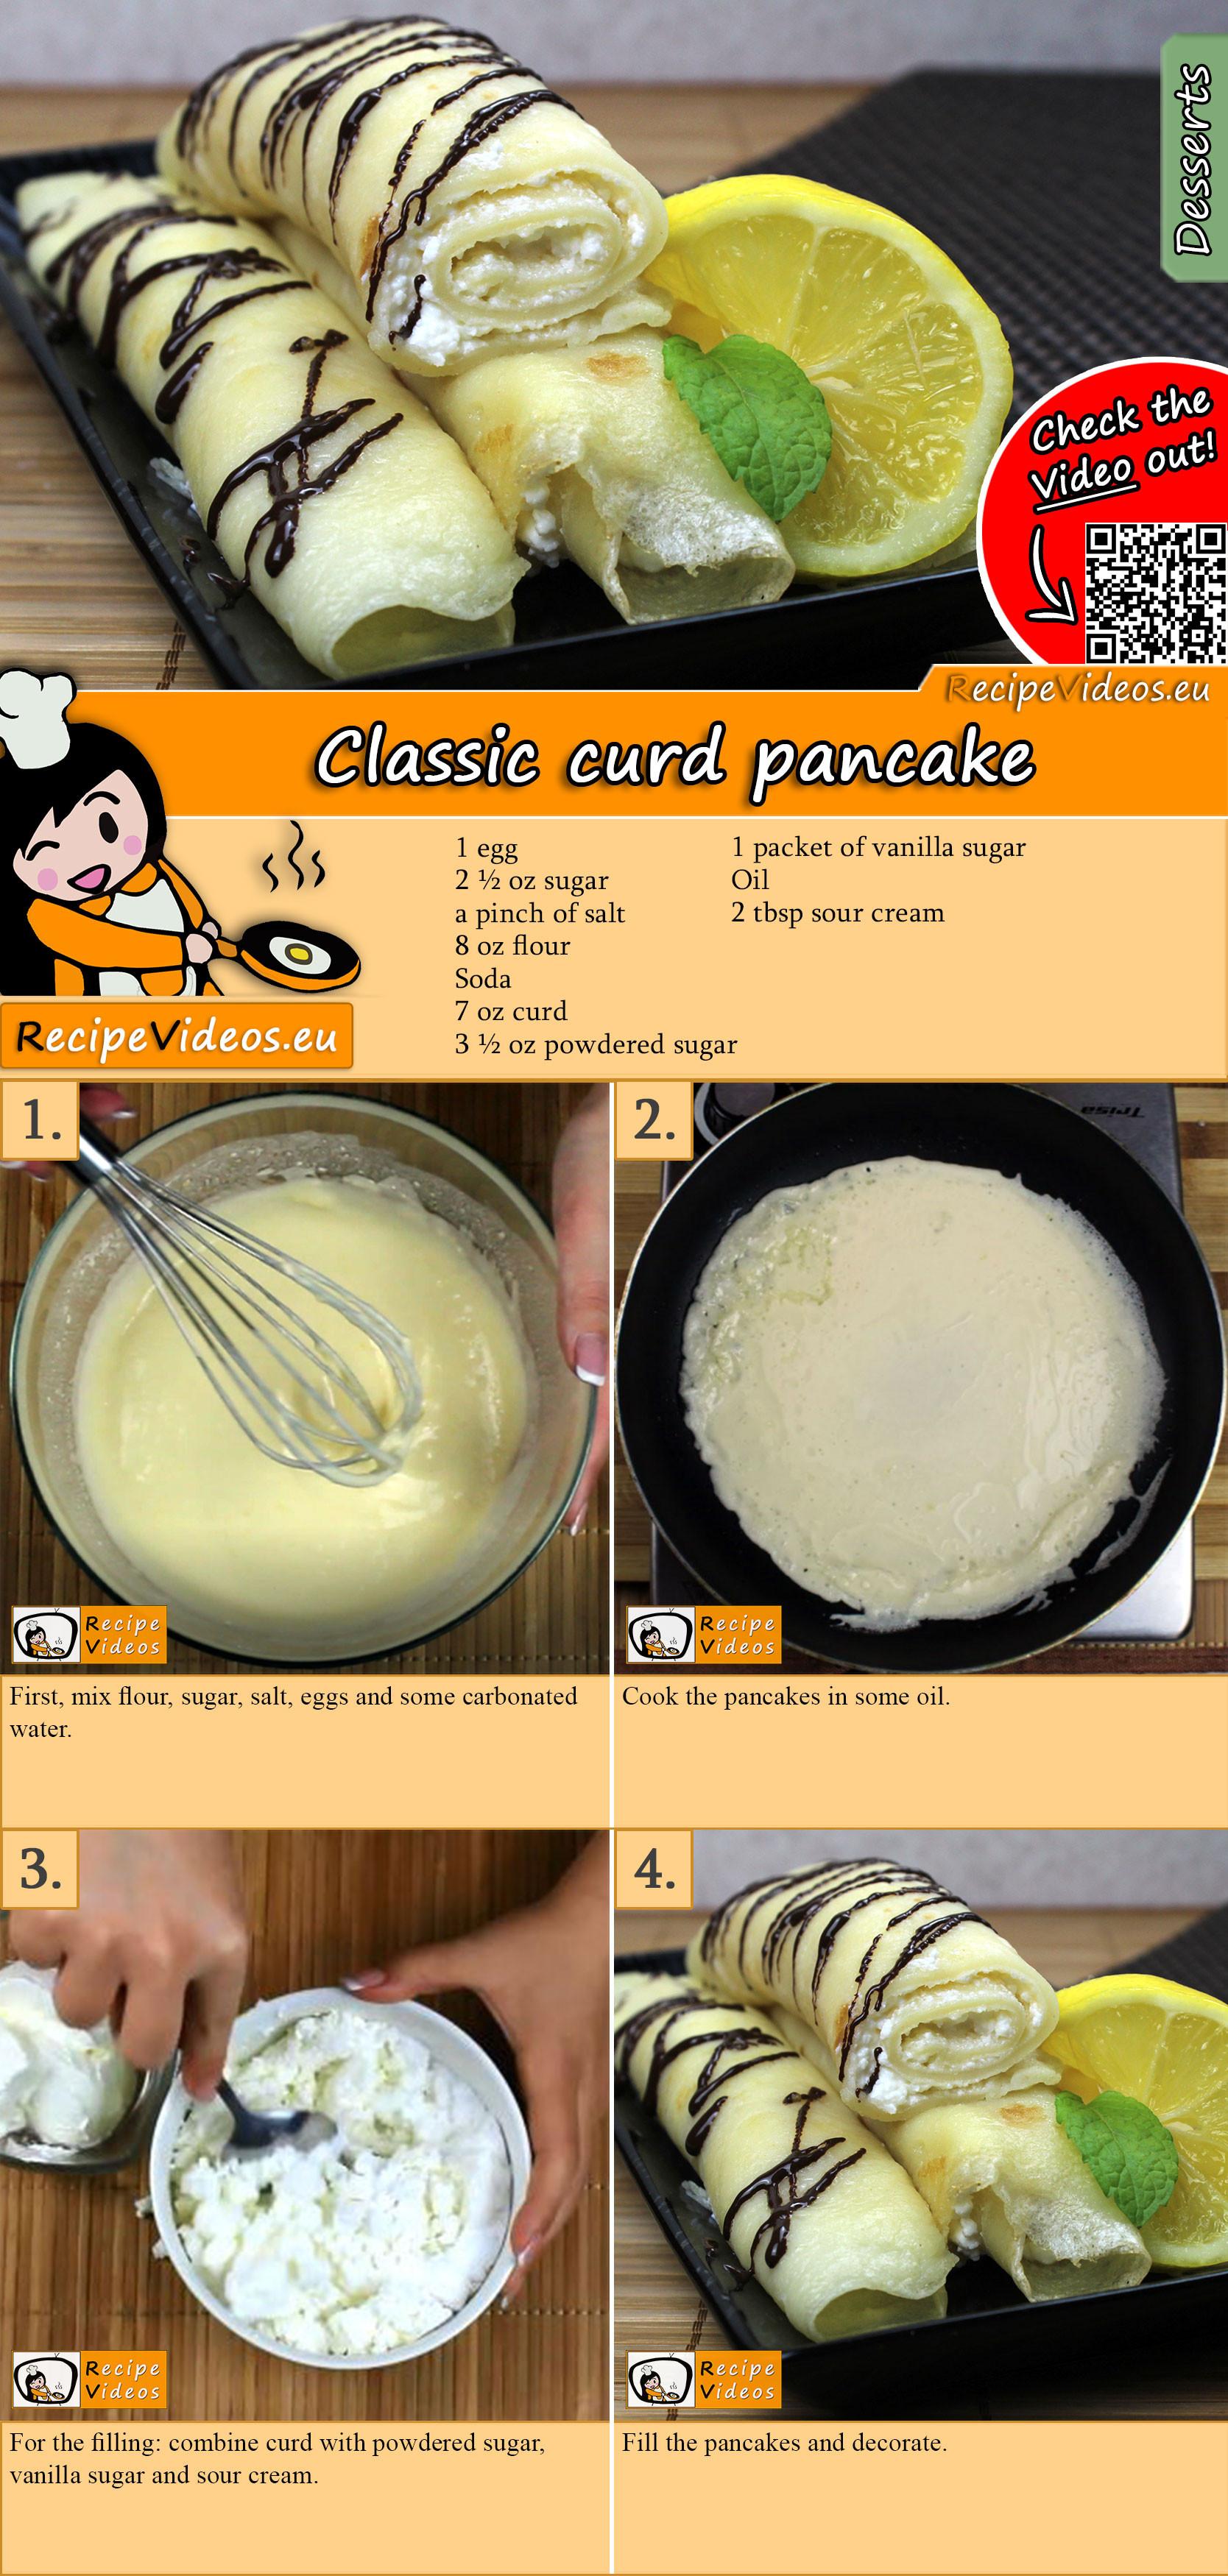 Classic curd pancake recipe with video